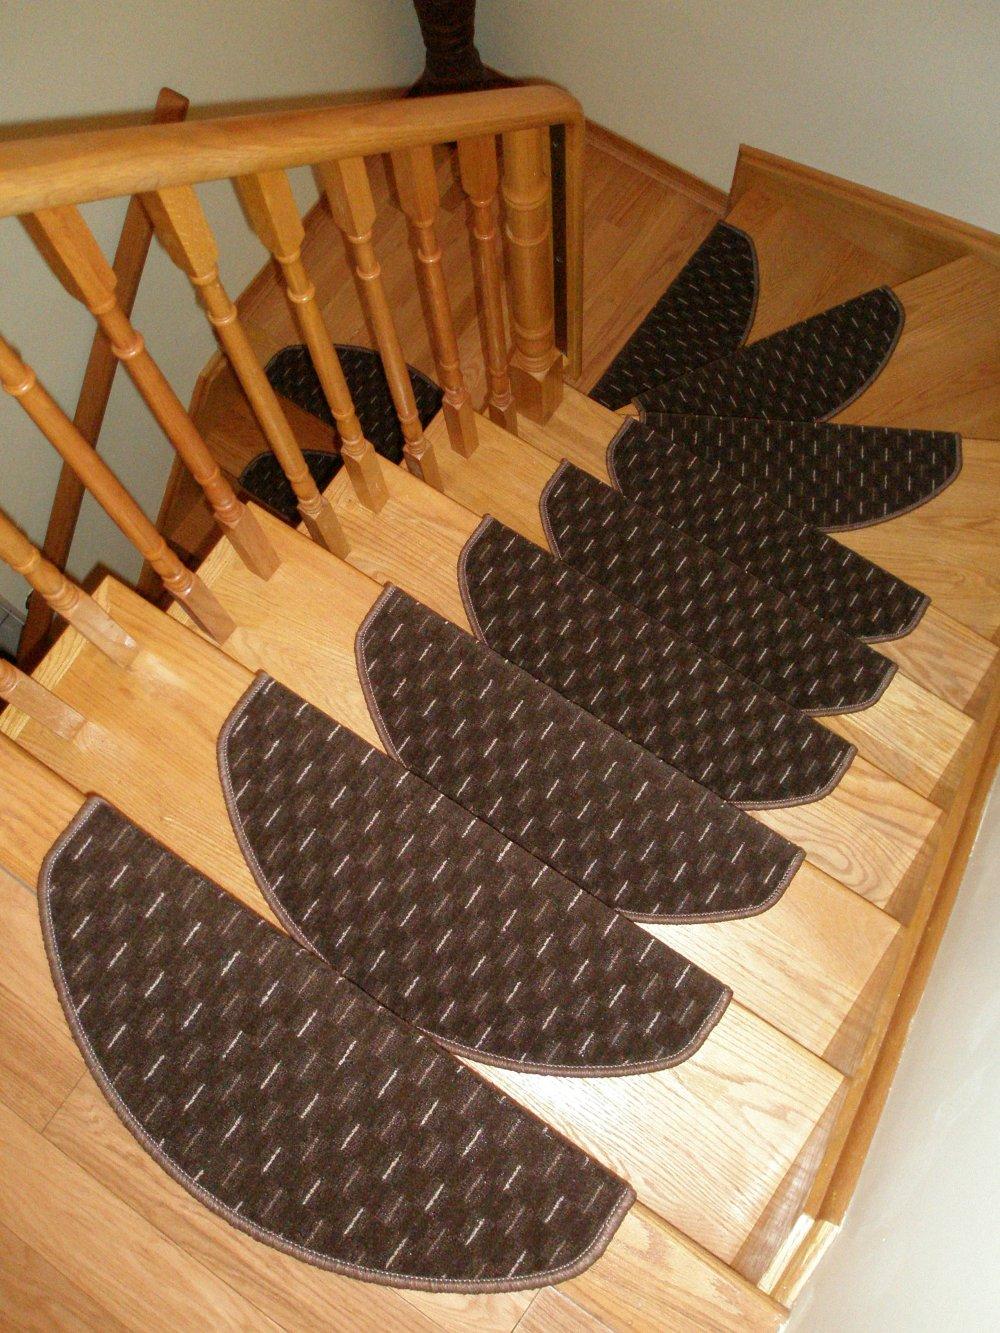 Stair Riser Veneer Stair Pads Lowes Lowes Stair Treads Related  Carpet Stair Treads%